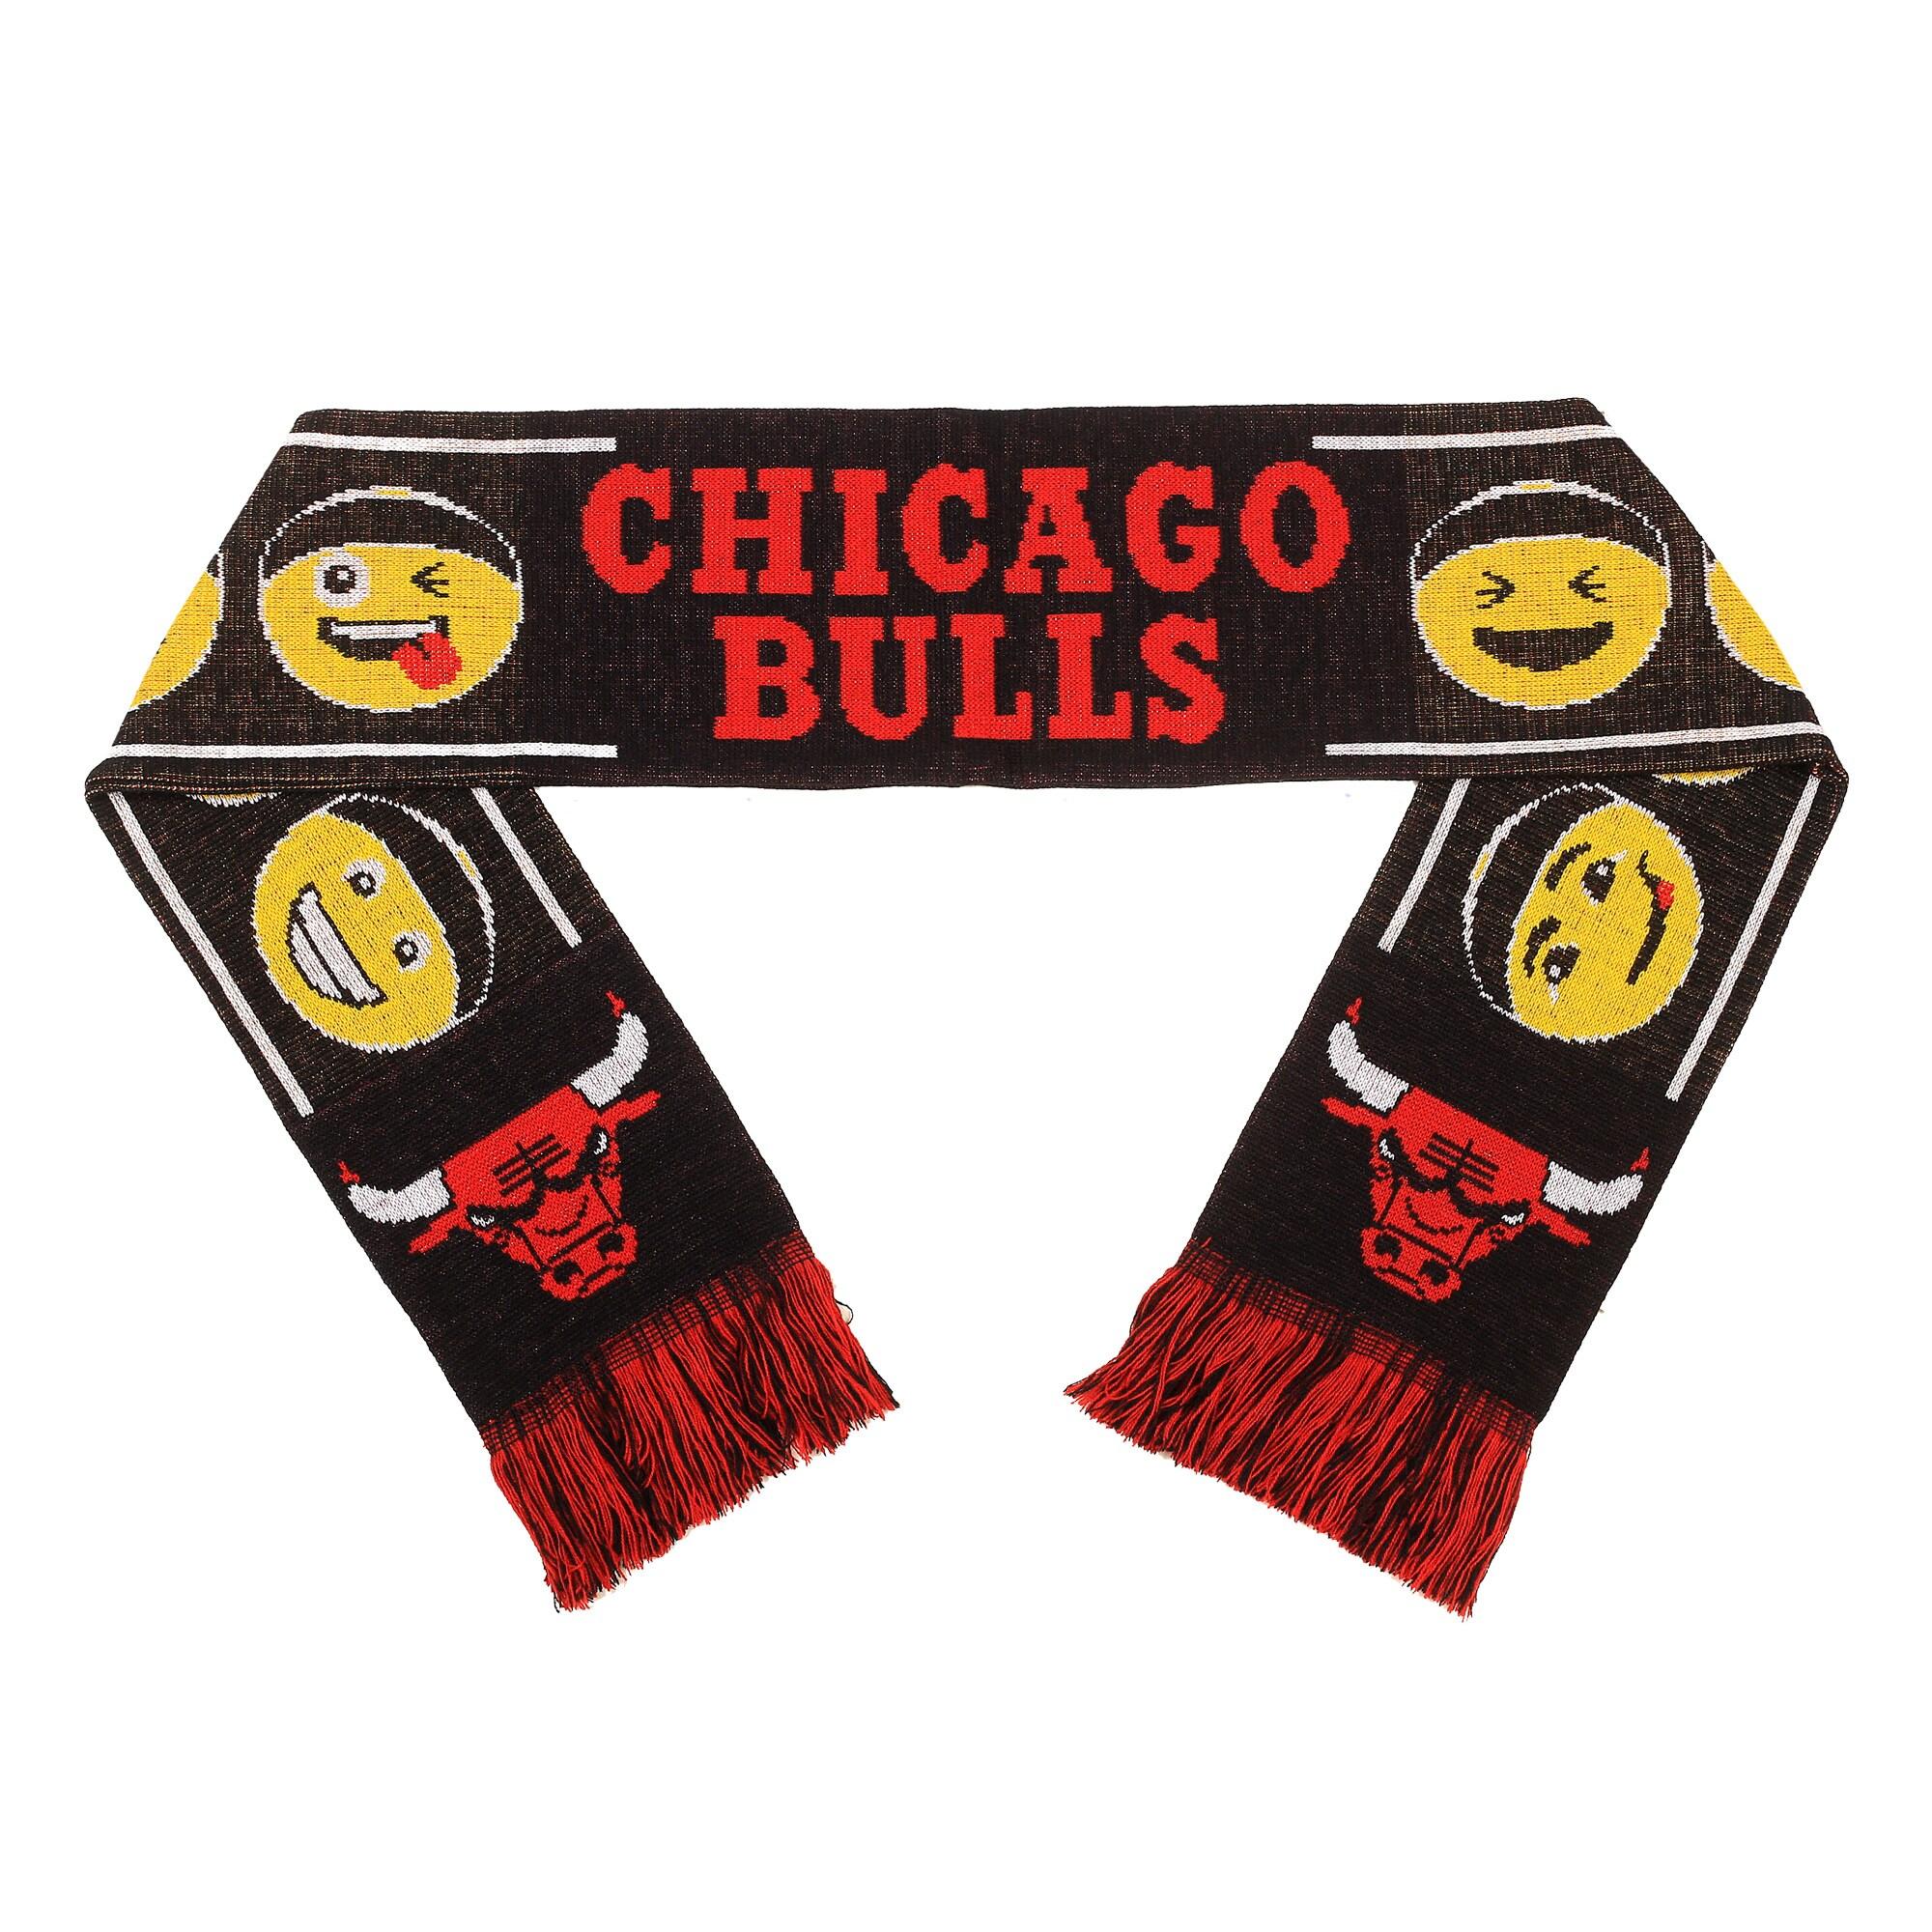 Chicago Bulls Teamoji Acrylic Scarf